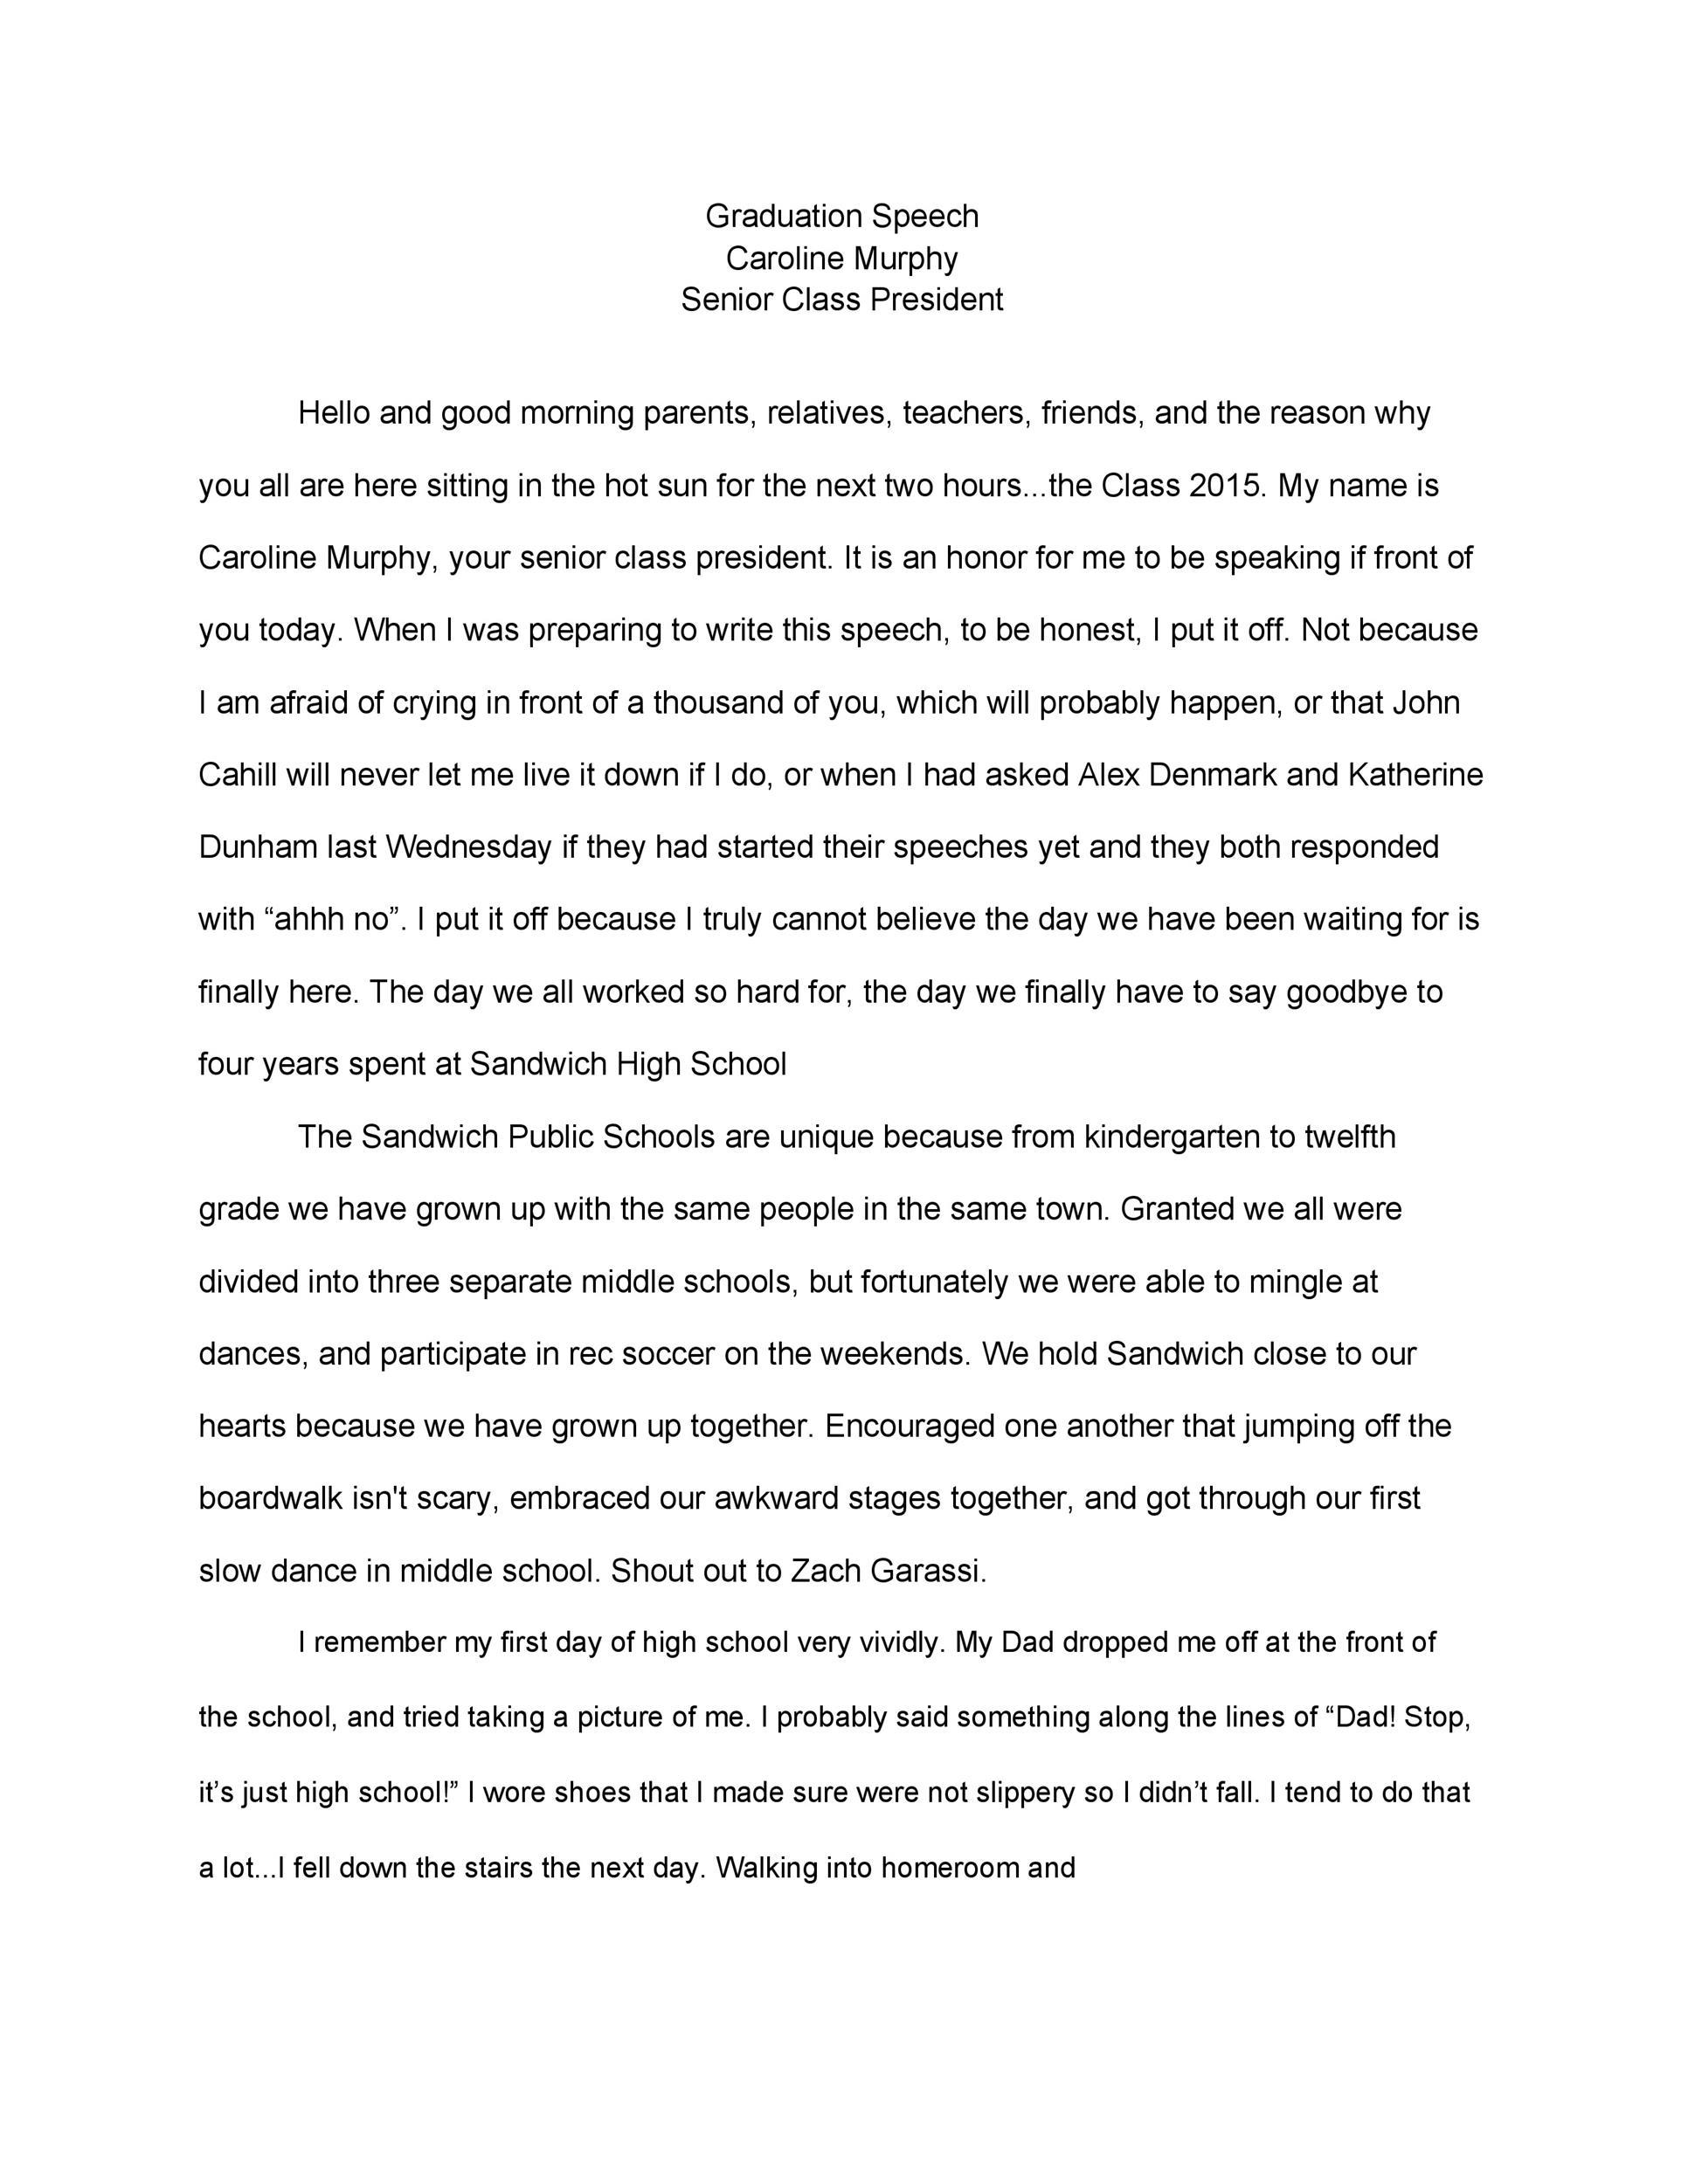 Free graduation speech example 22